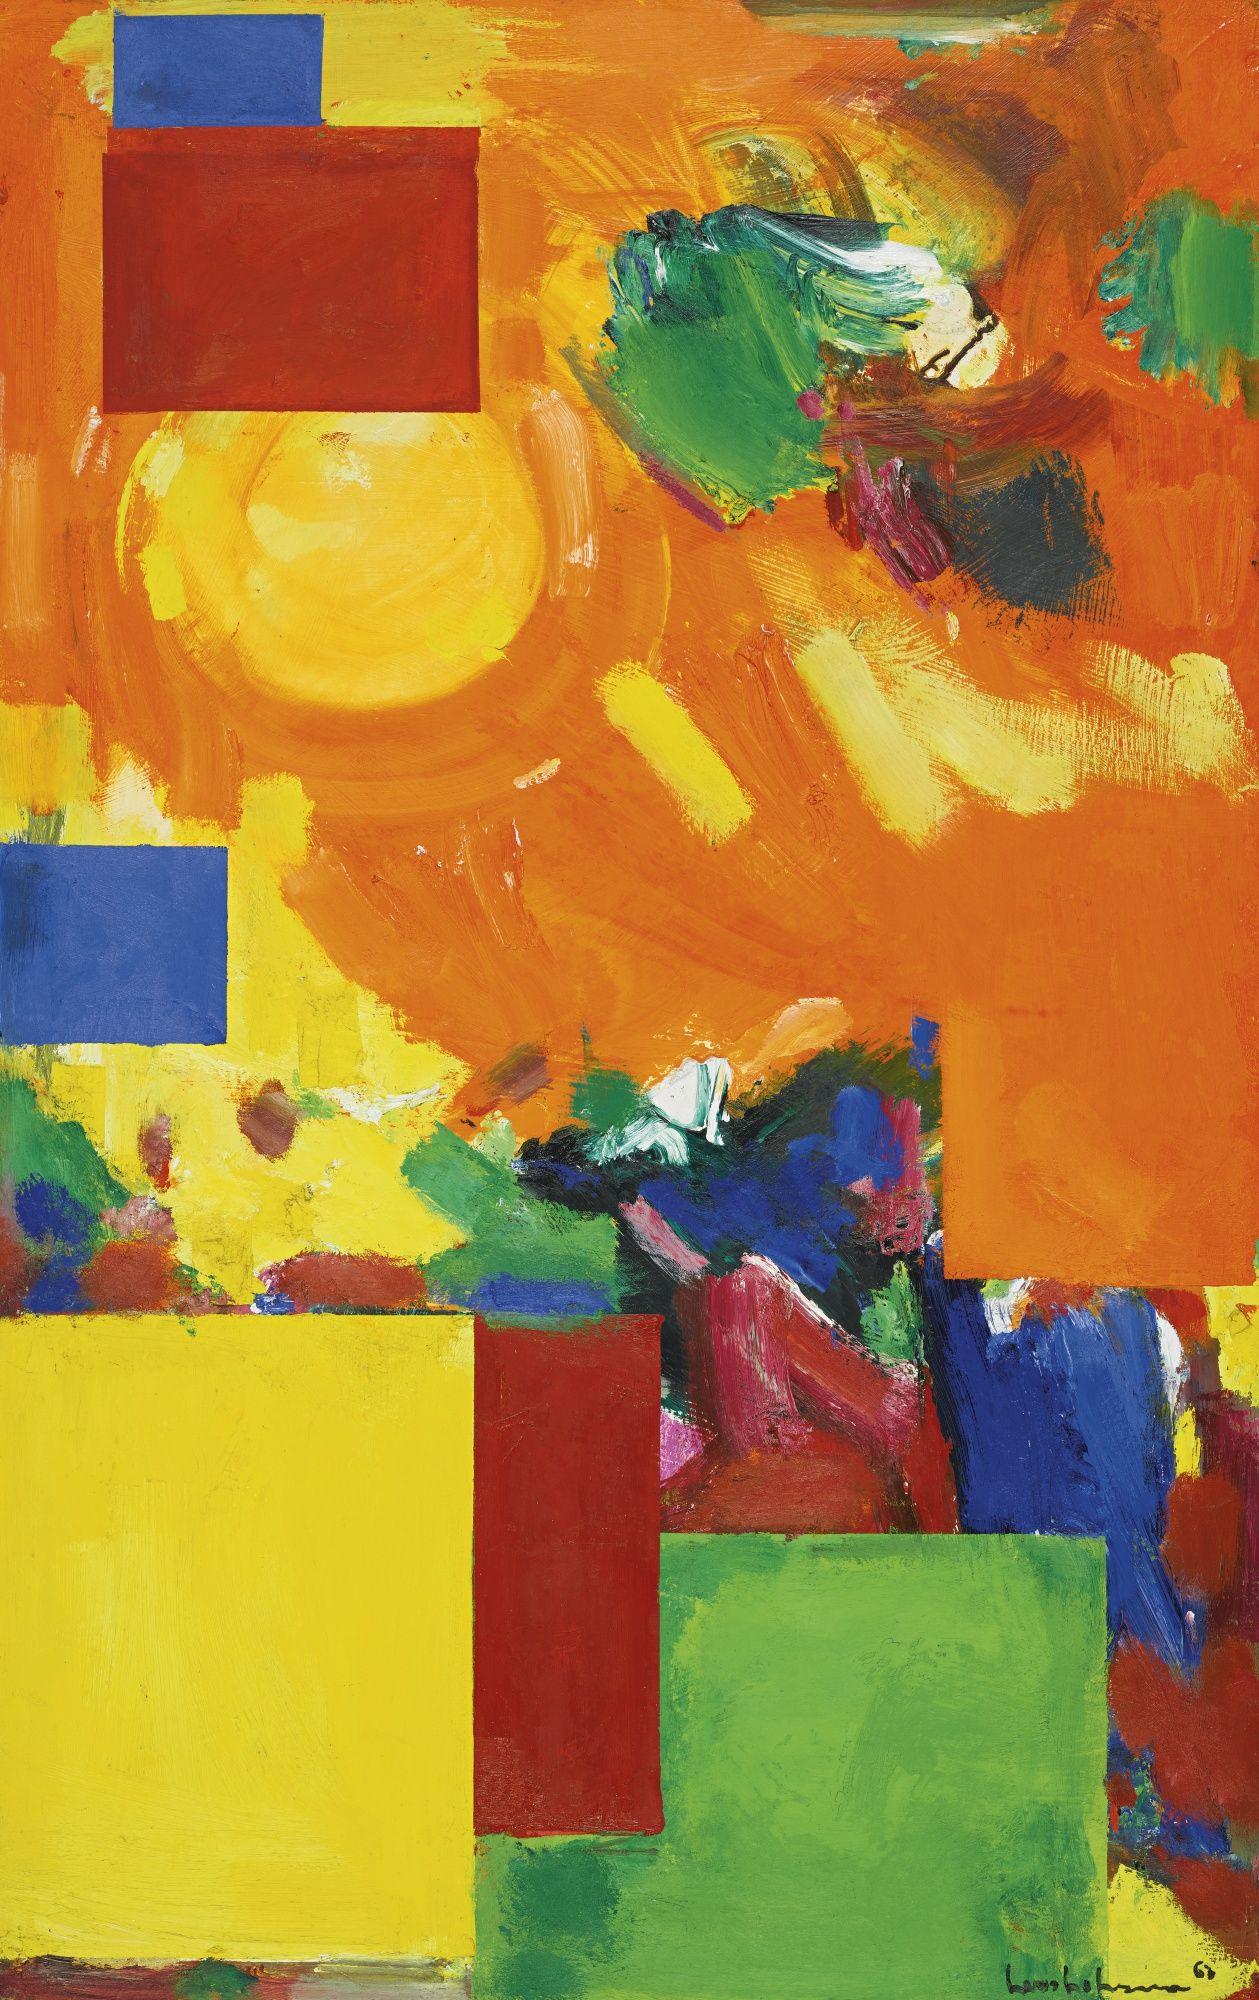 Hans Hofmann Was A German Born American Abstract Expressionist Painter Hofmann S